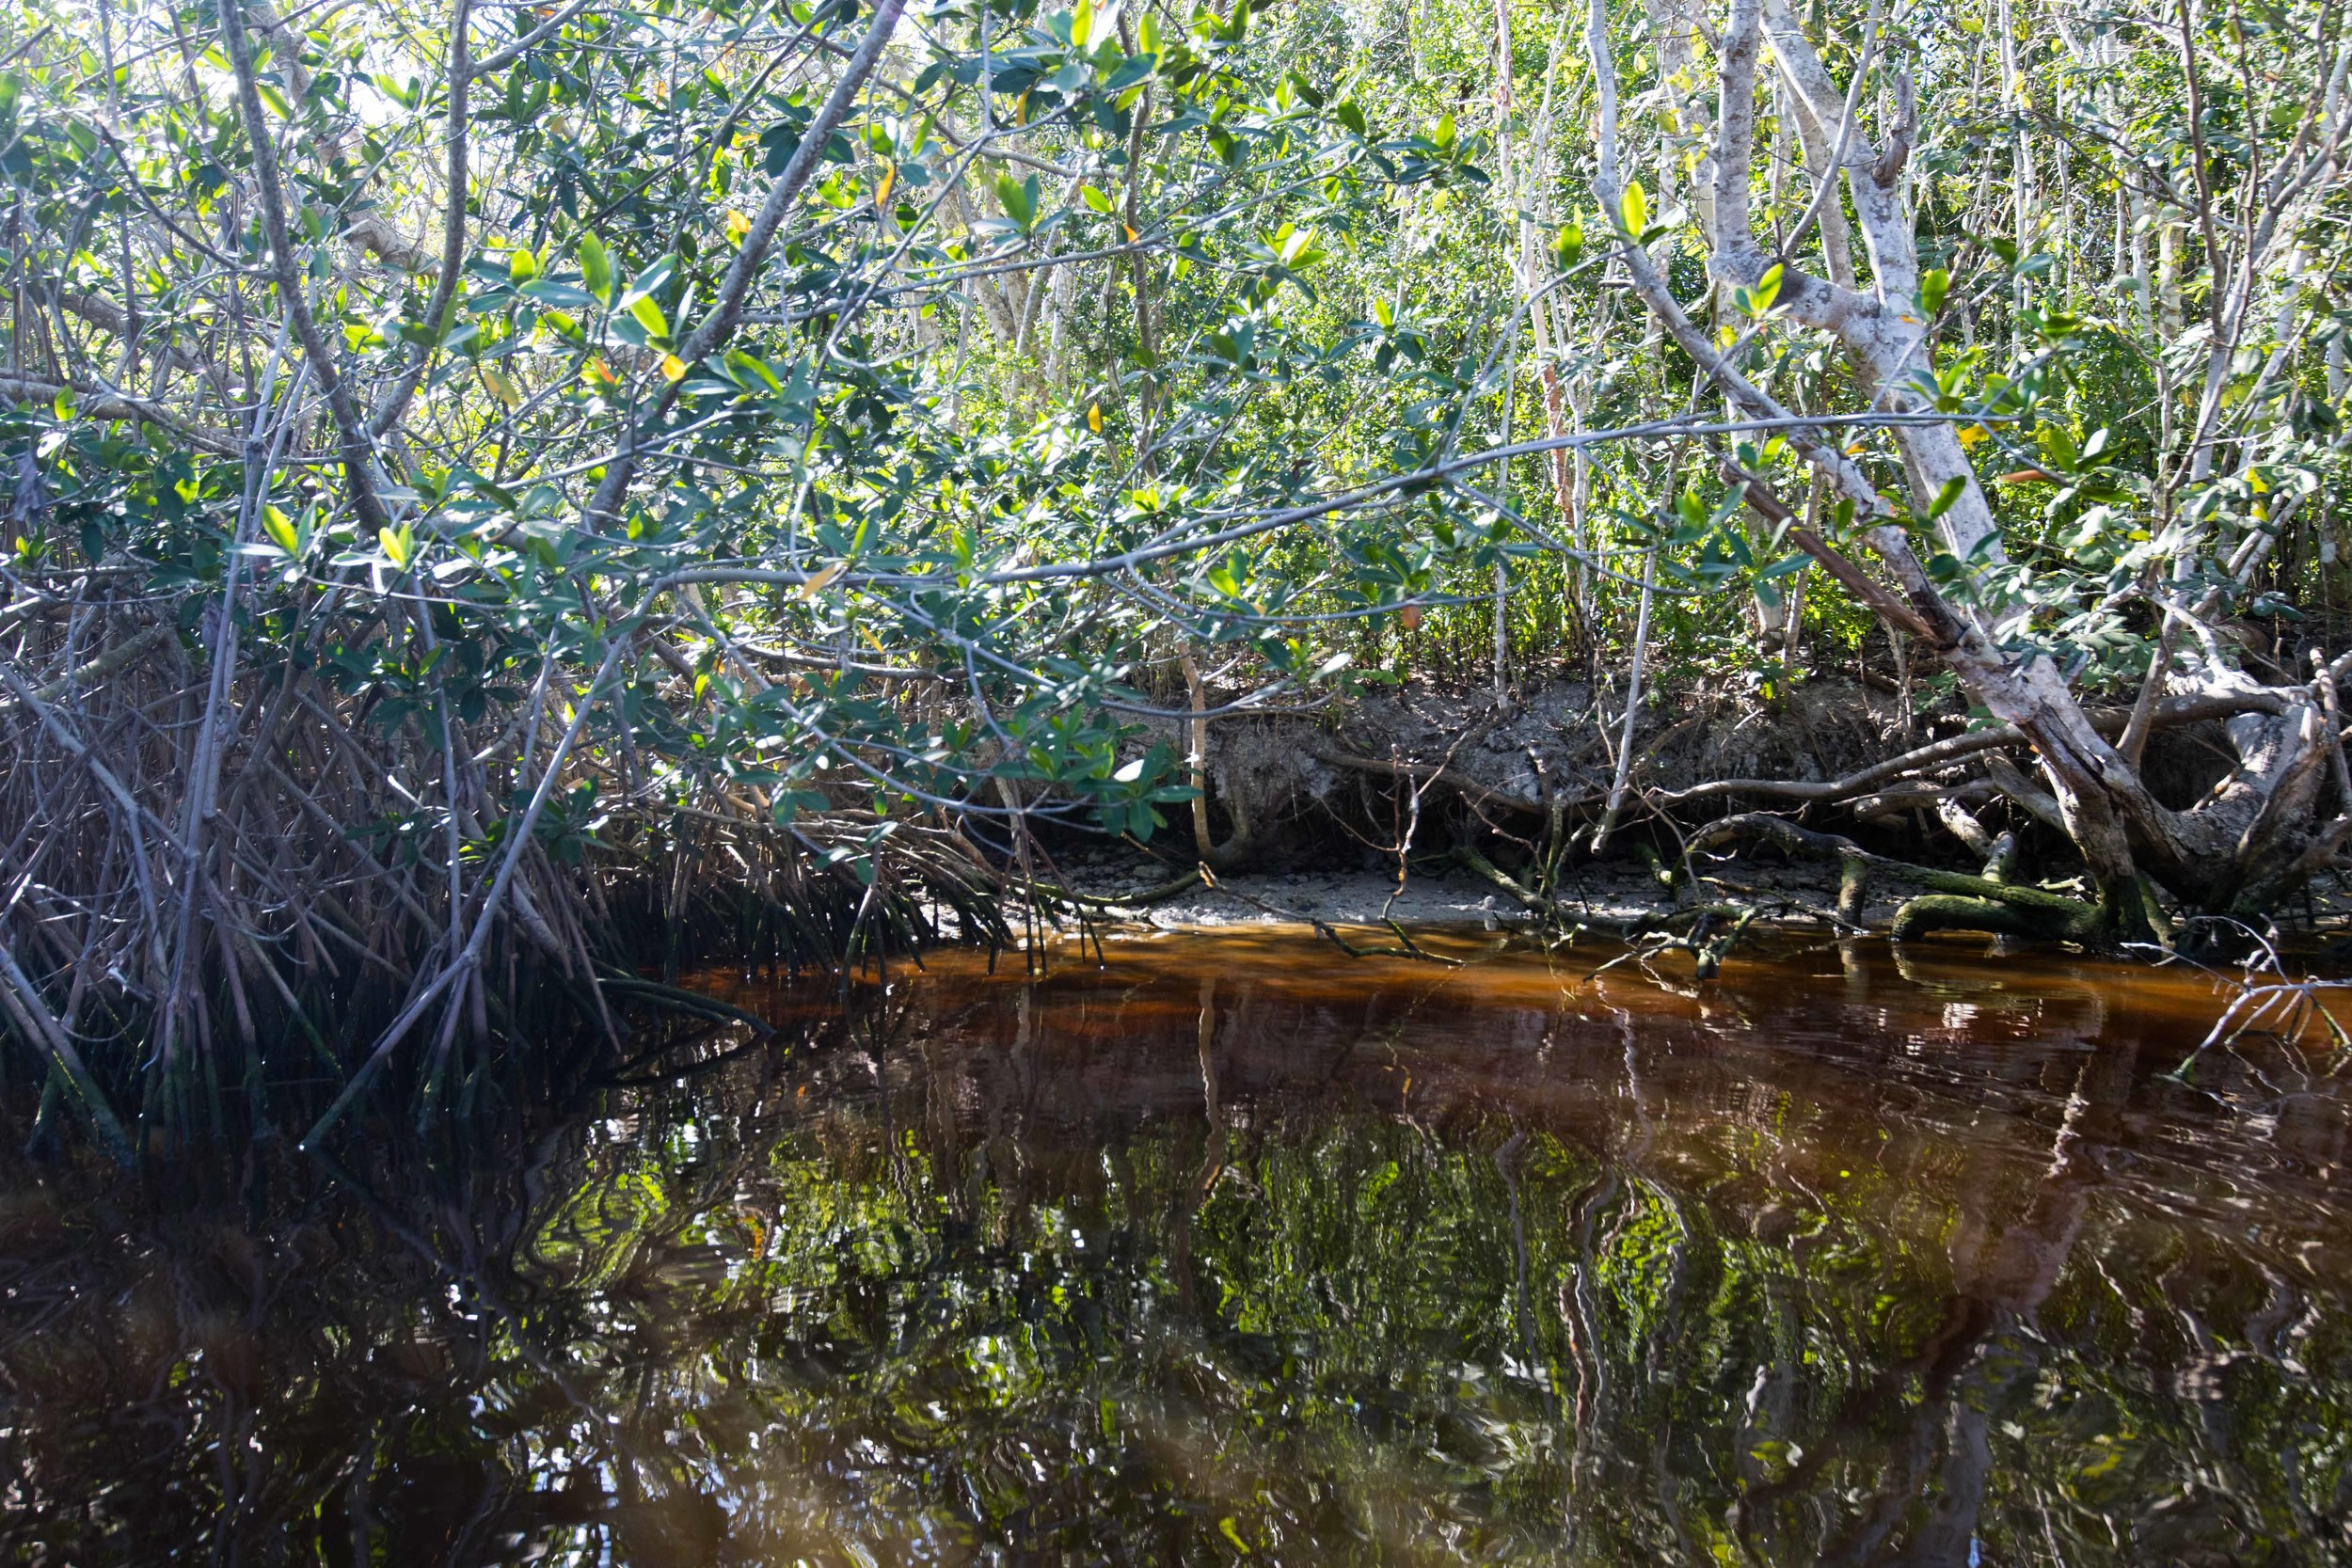 2019_Everglades-47.jpg